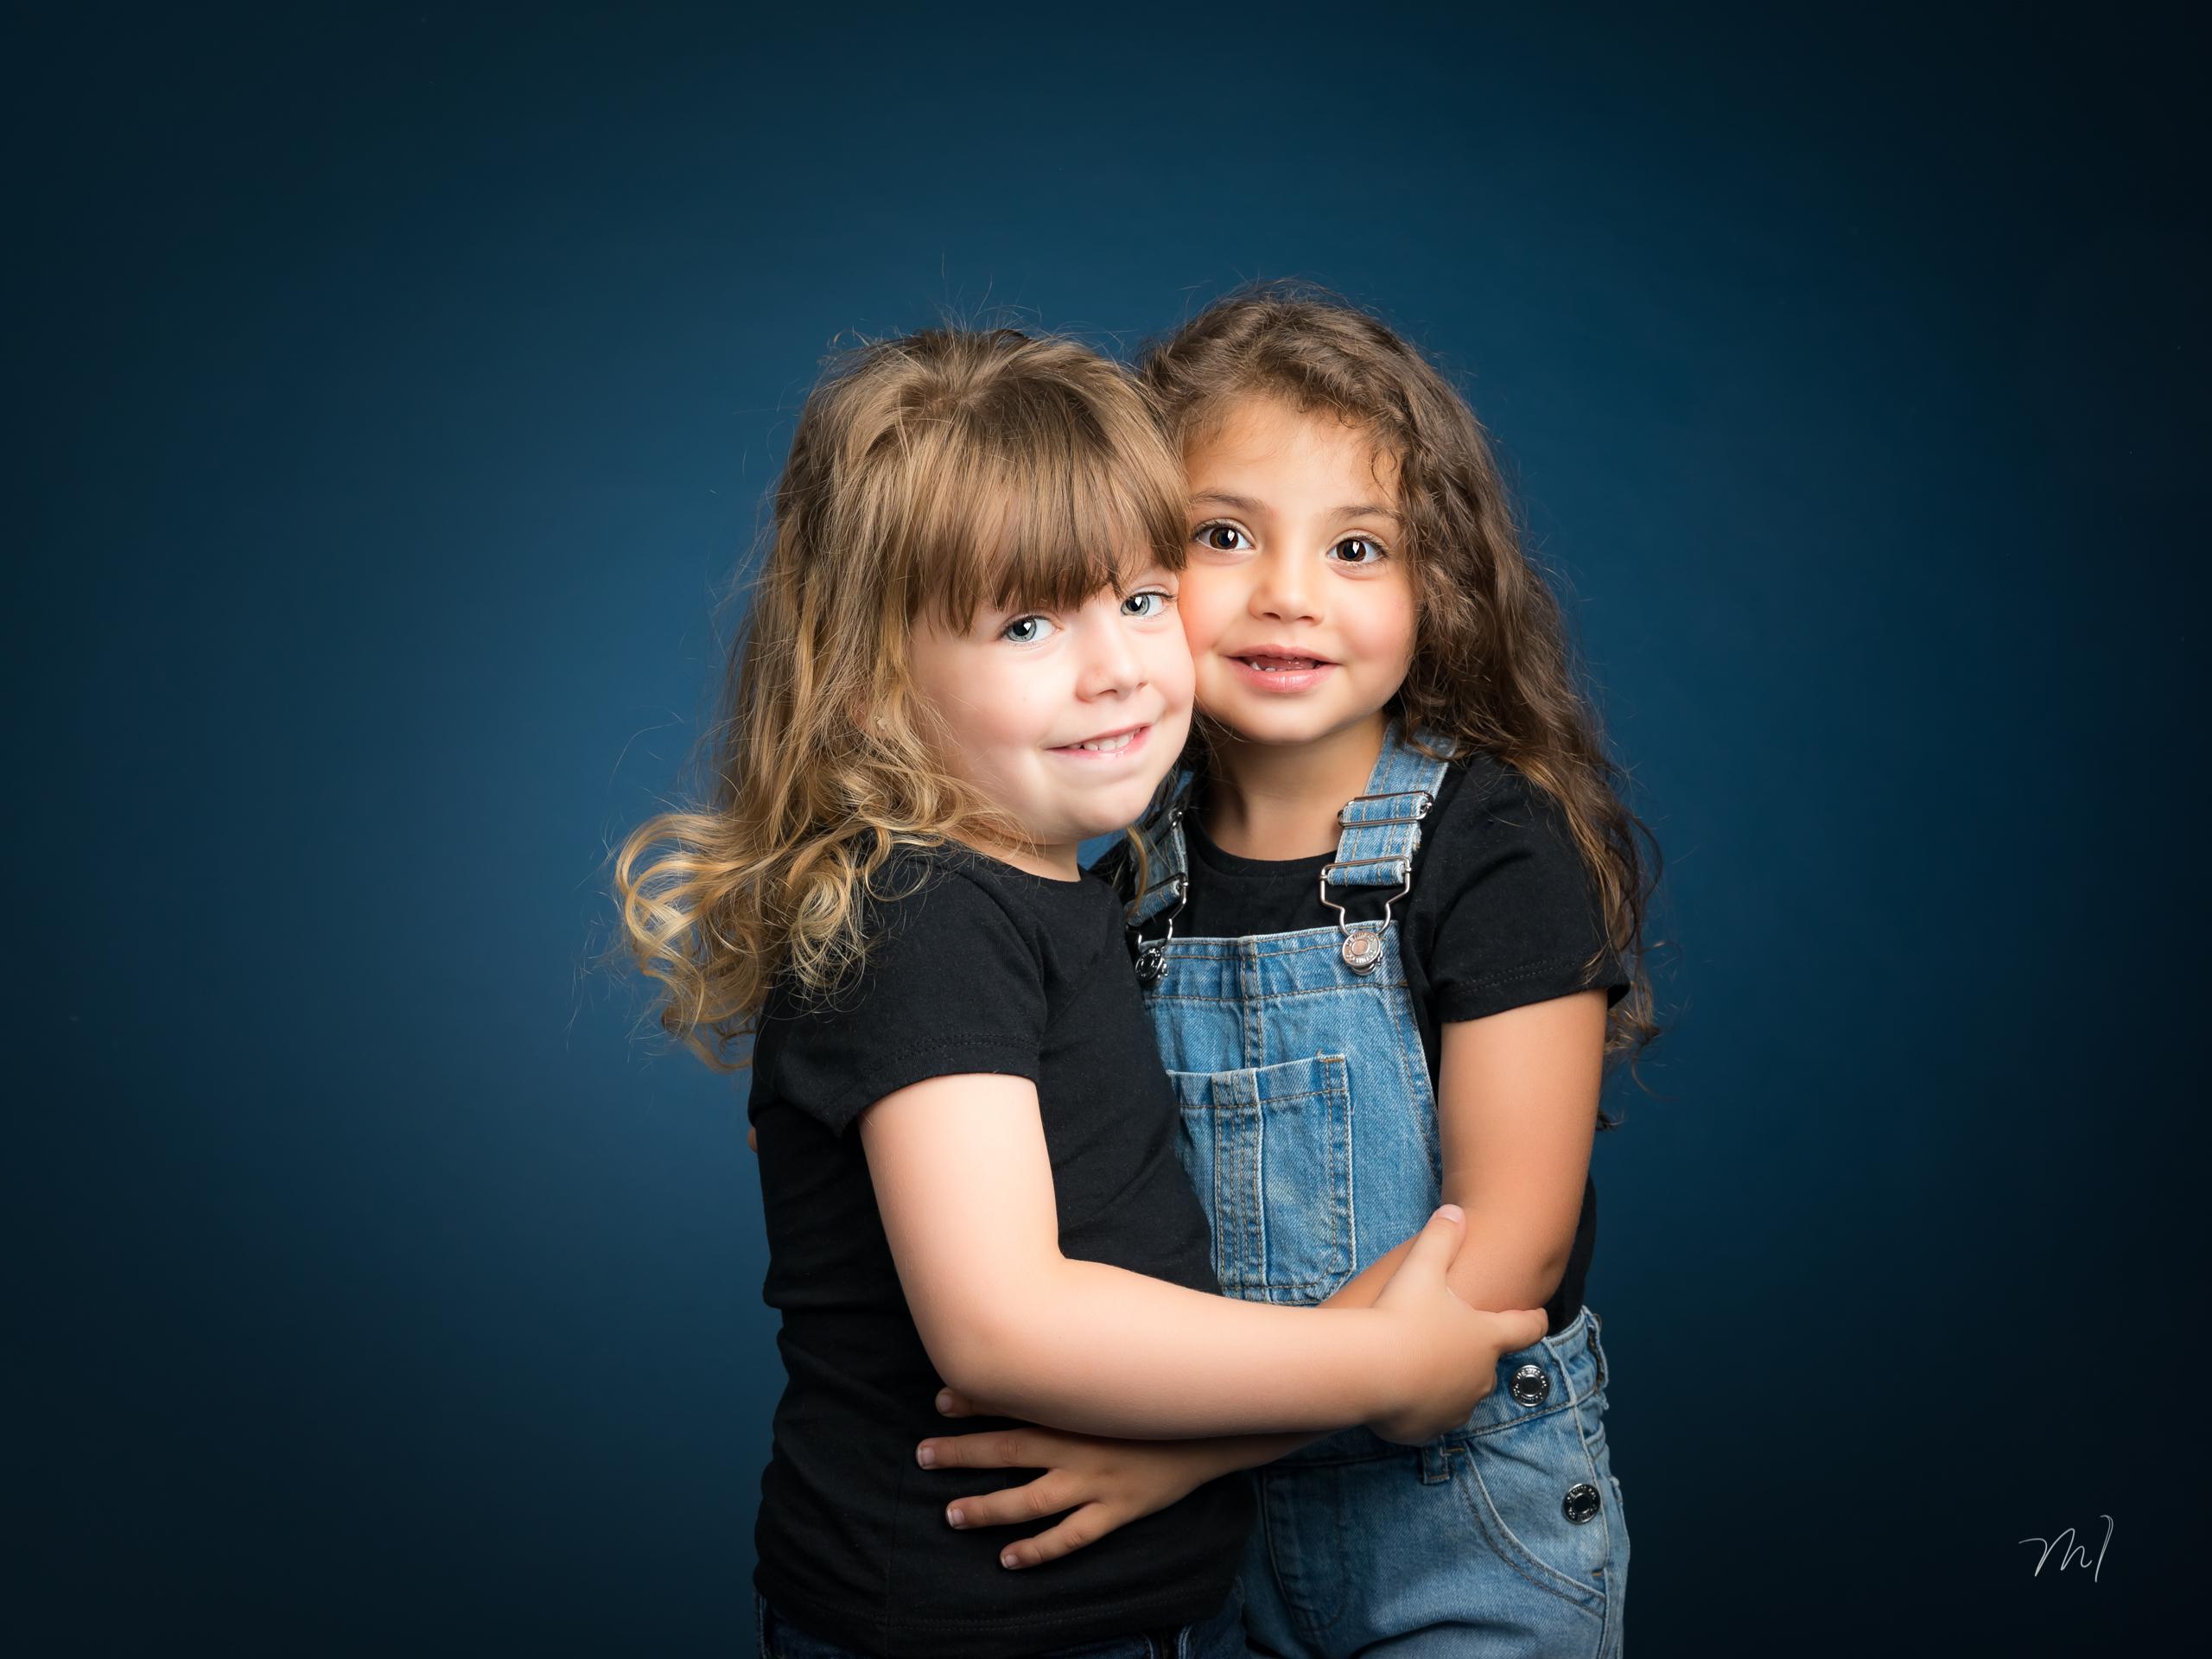 Familles & enfants - Marie Ismalun photographe-21